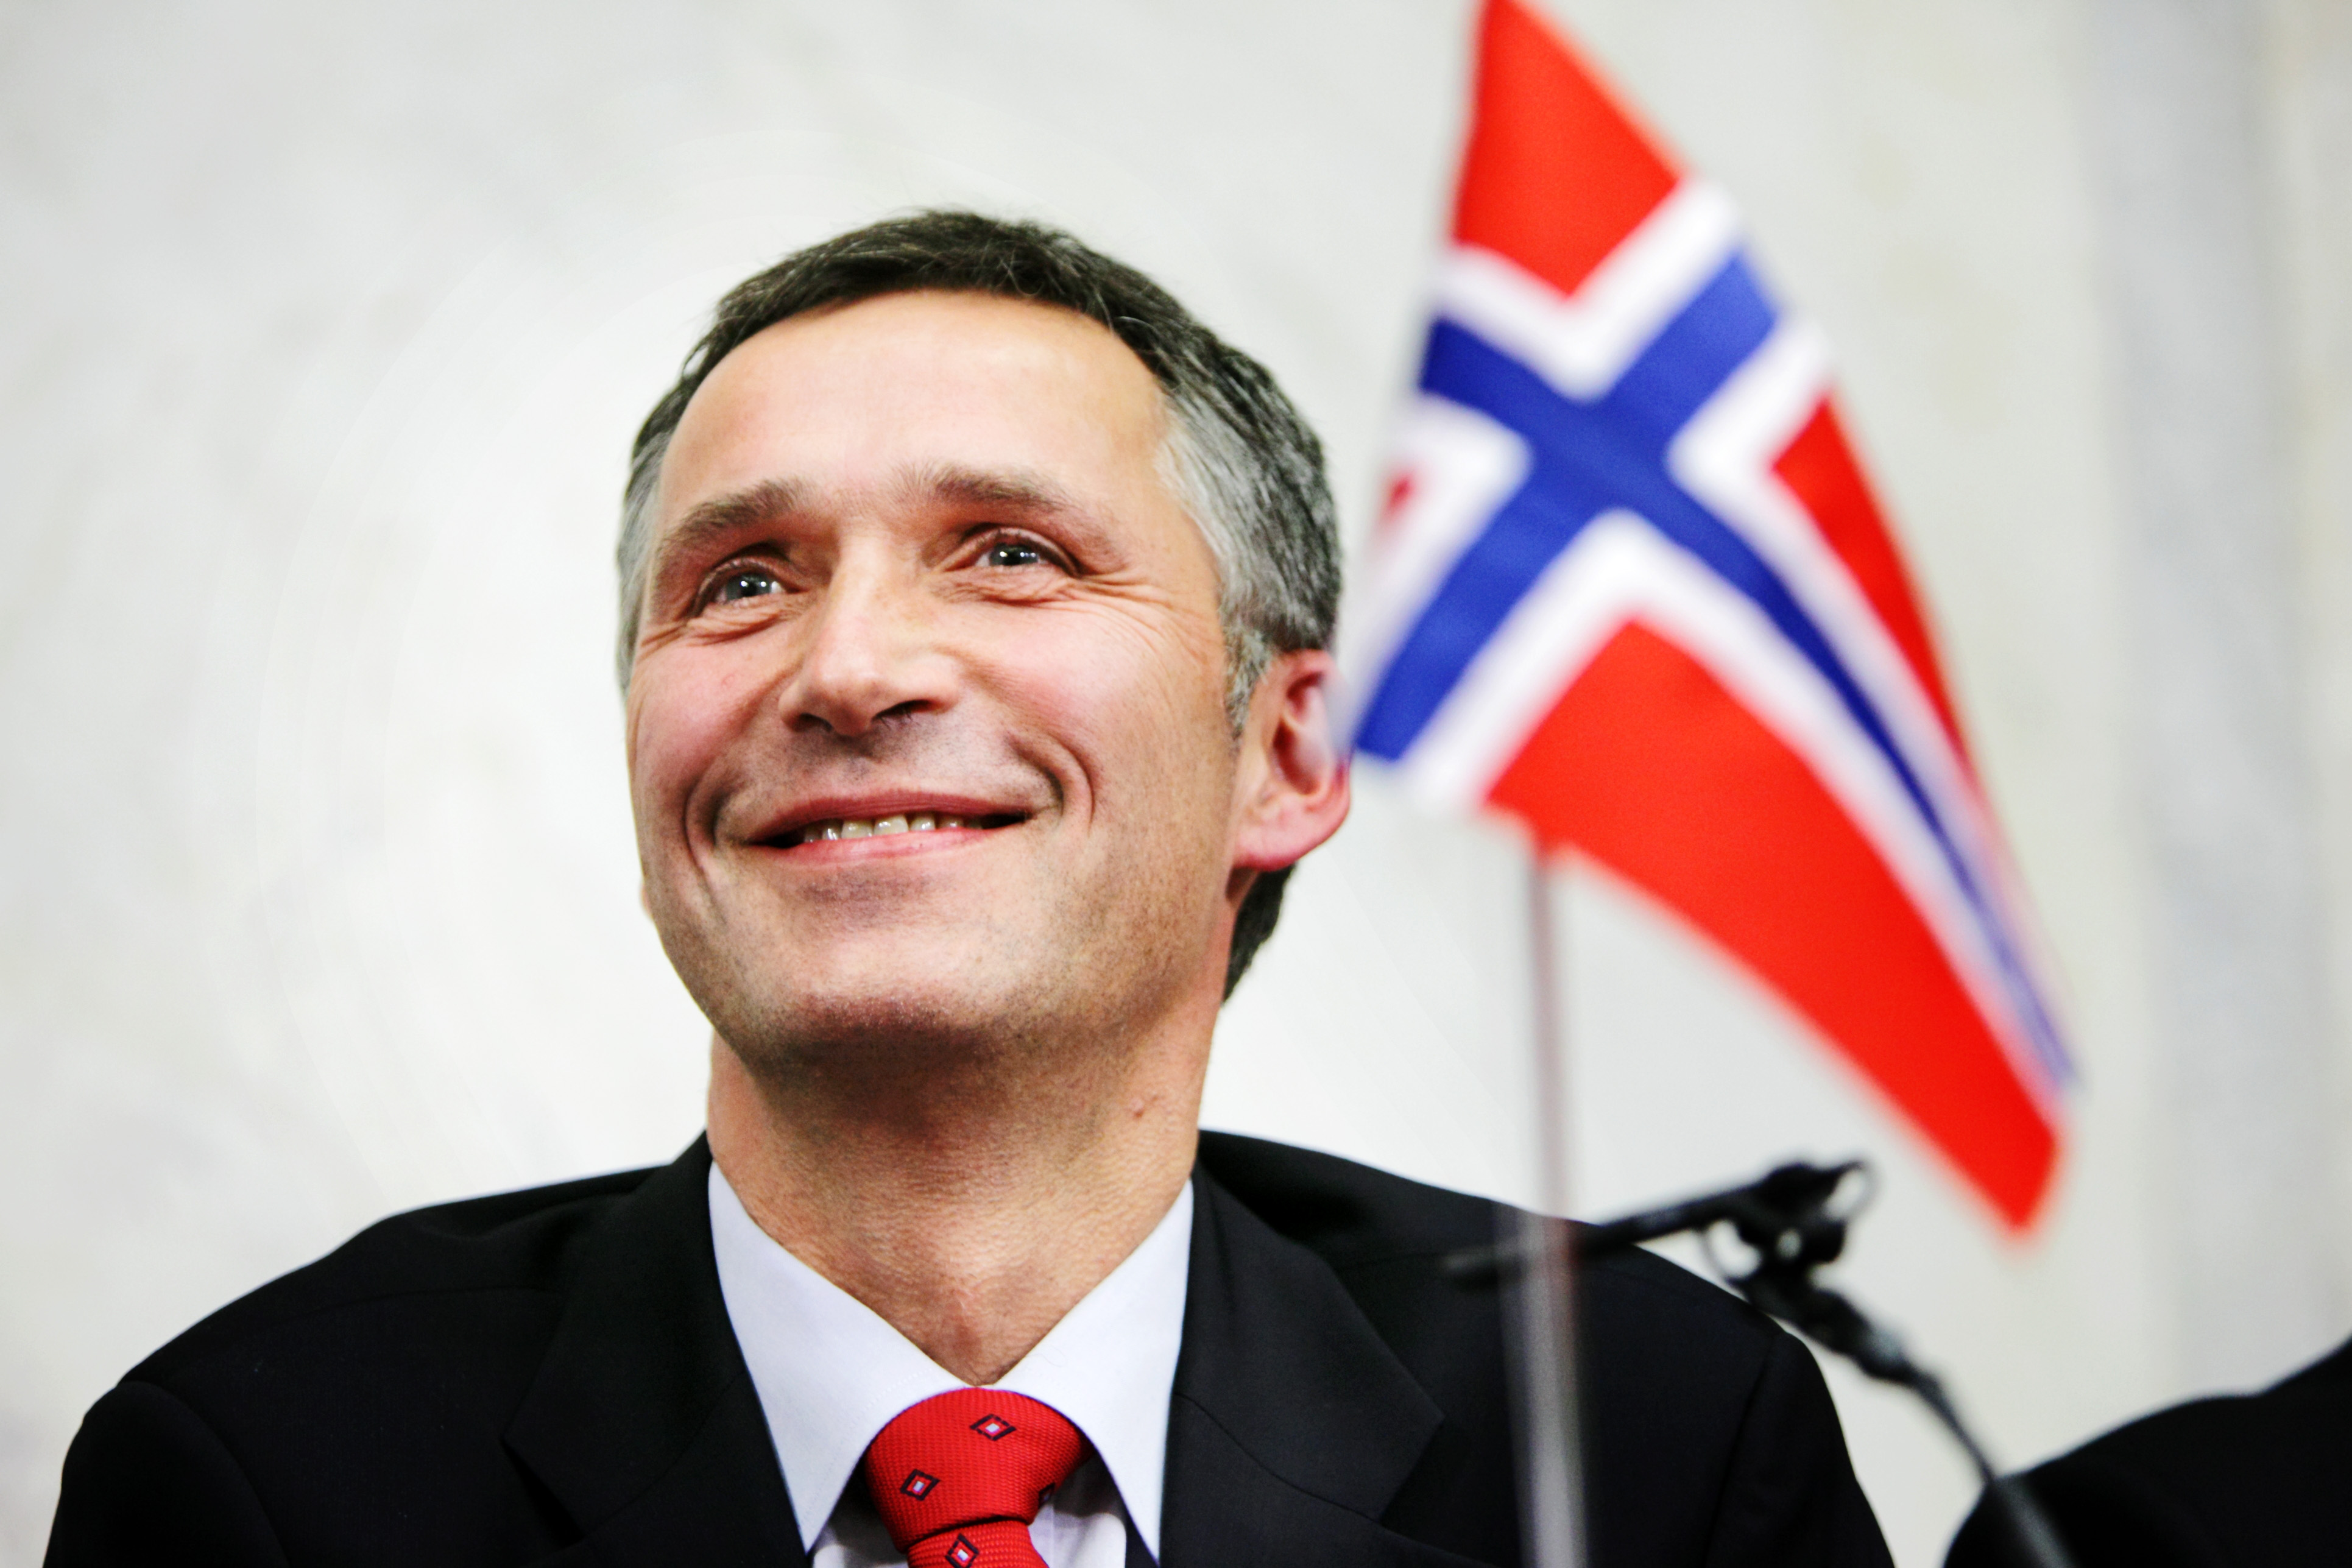 Jens Stoltenberg in 2009.